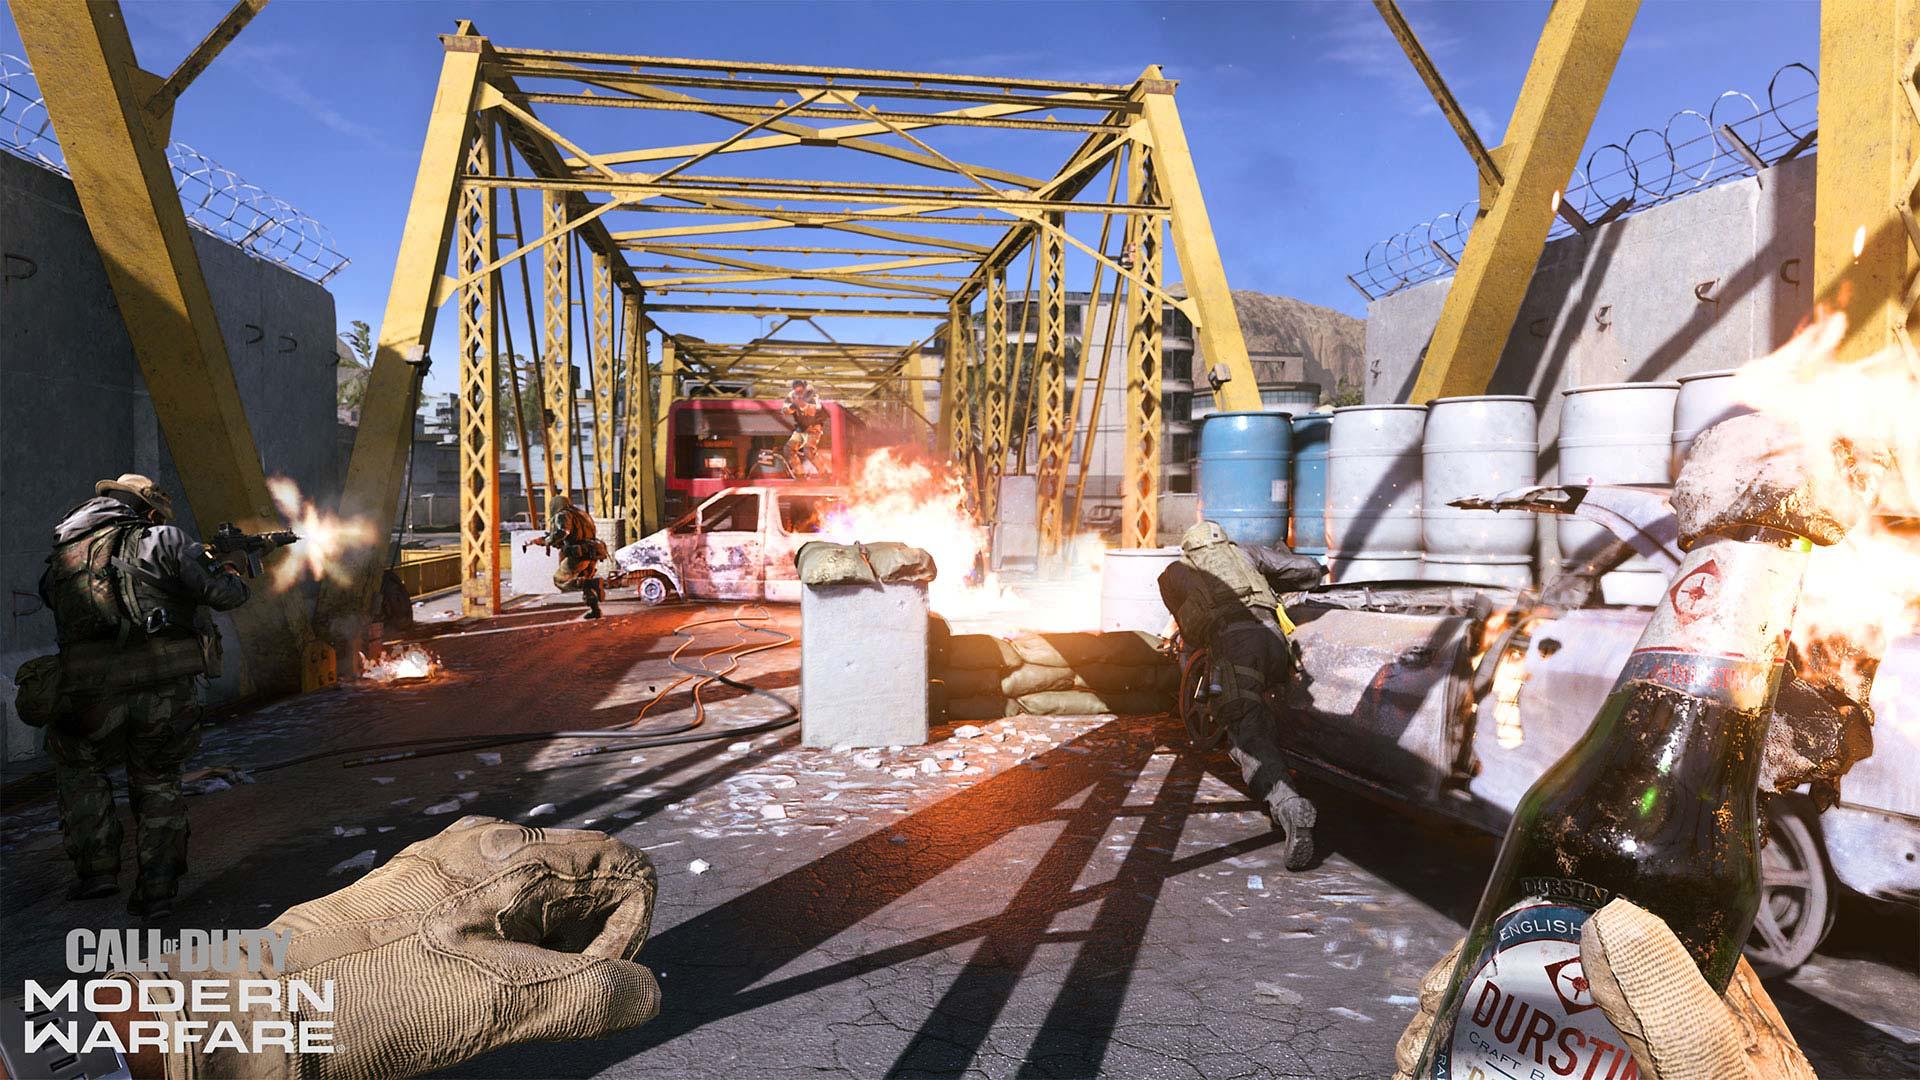 Call of Duty: Modern Warfare Molotov cocktail